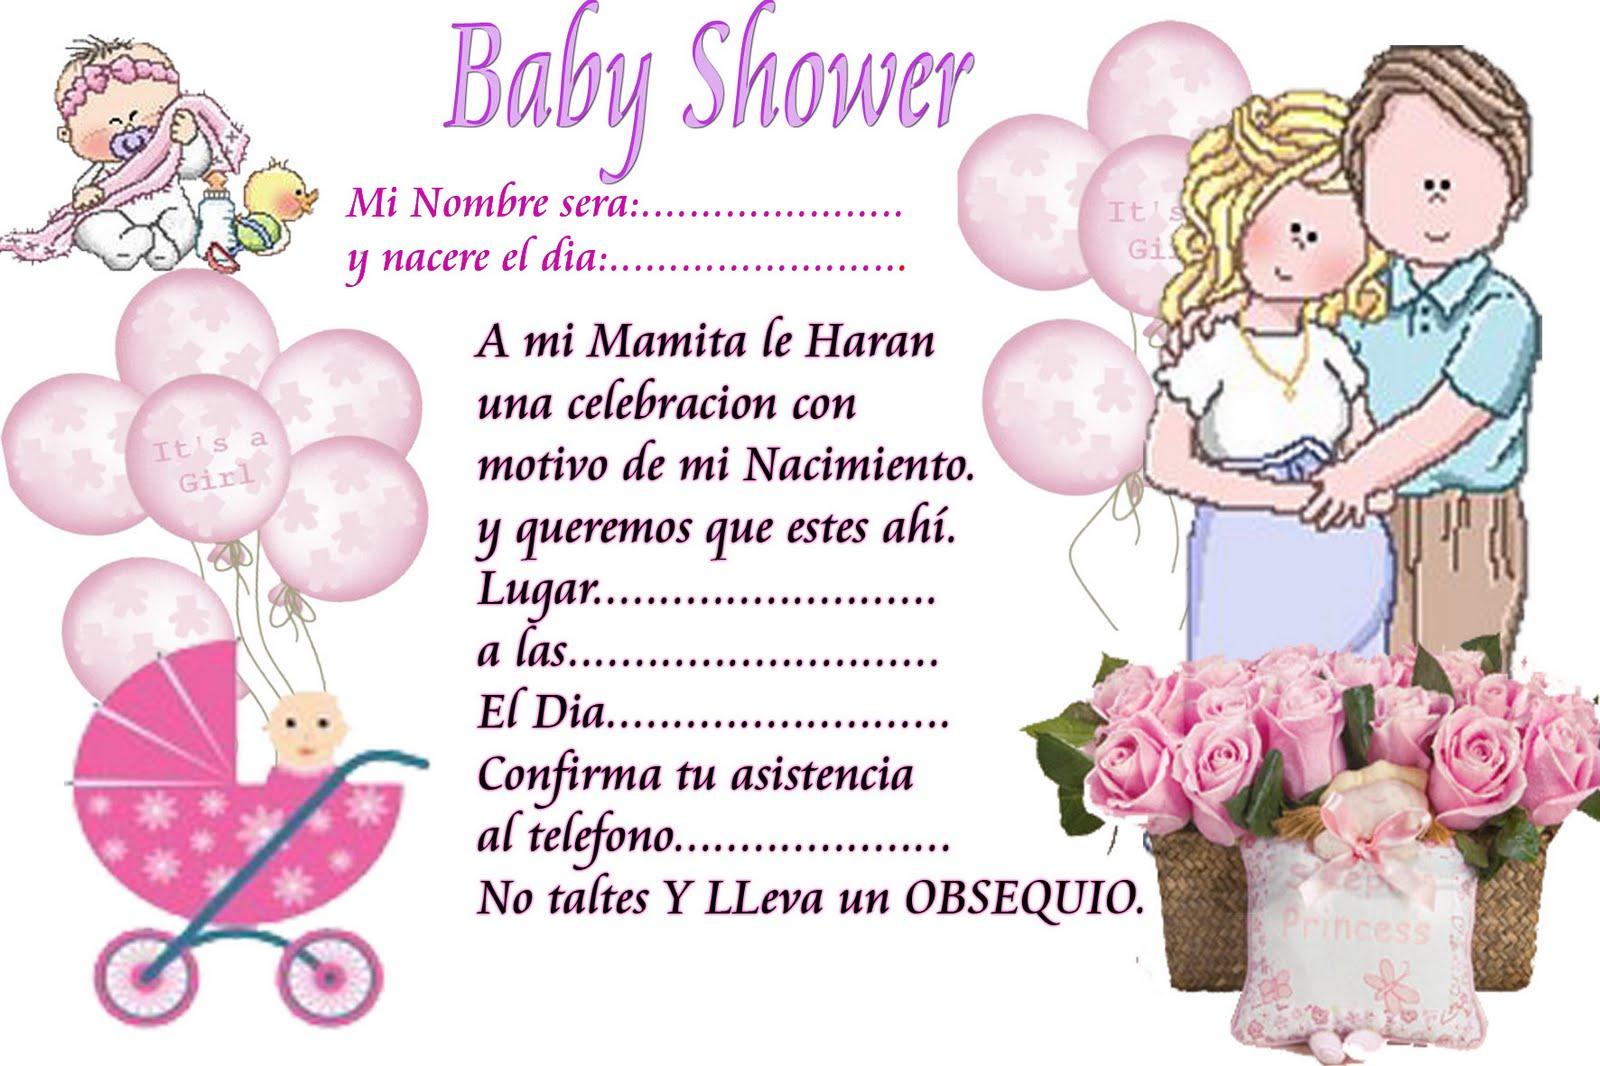 Juegos Para Baby Shower Animados Shower Animados Para Baby Juegos